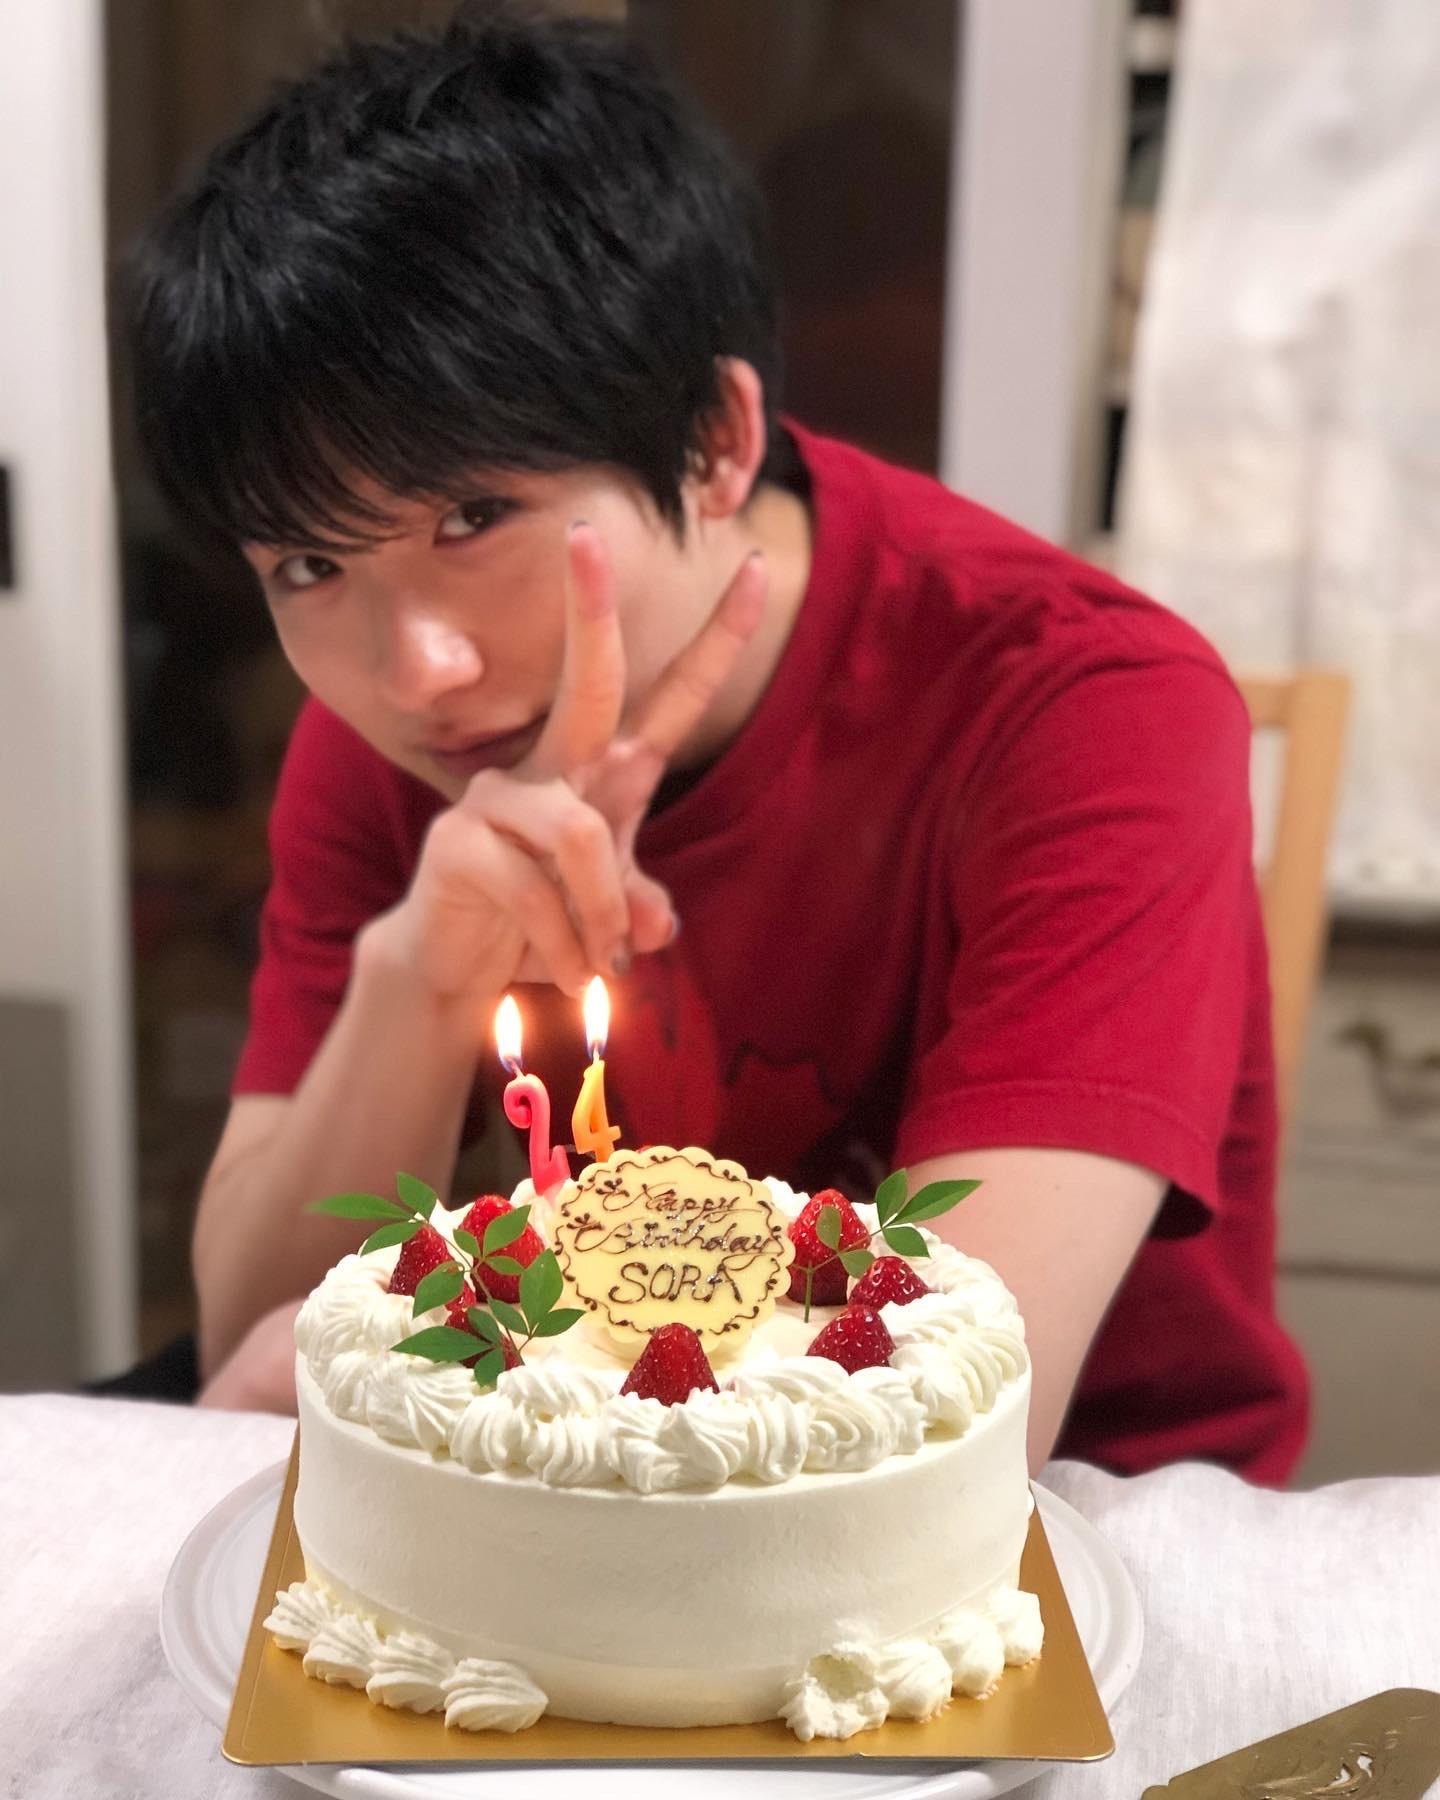 Happy Birthday Sora!24歳おめでとう!_a0157409_14542459.jpeg